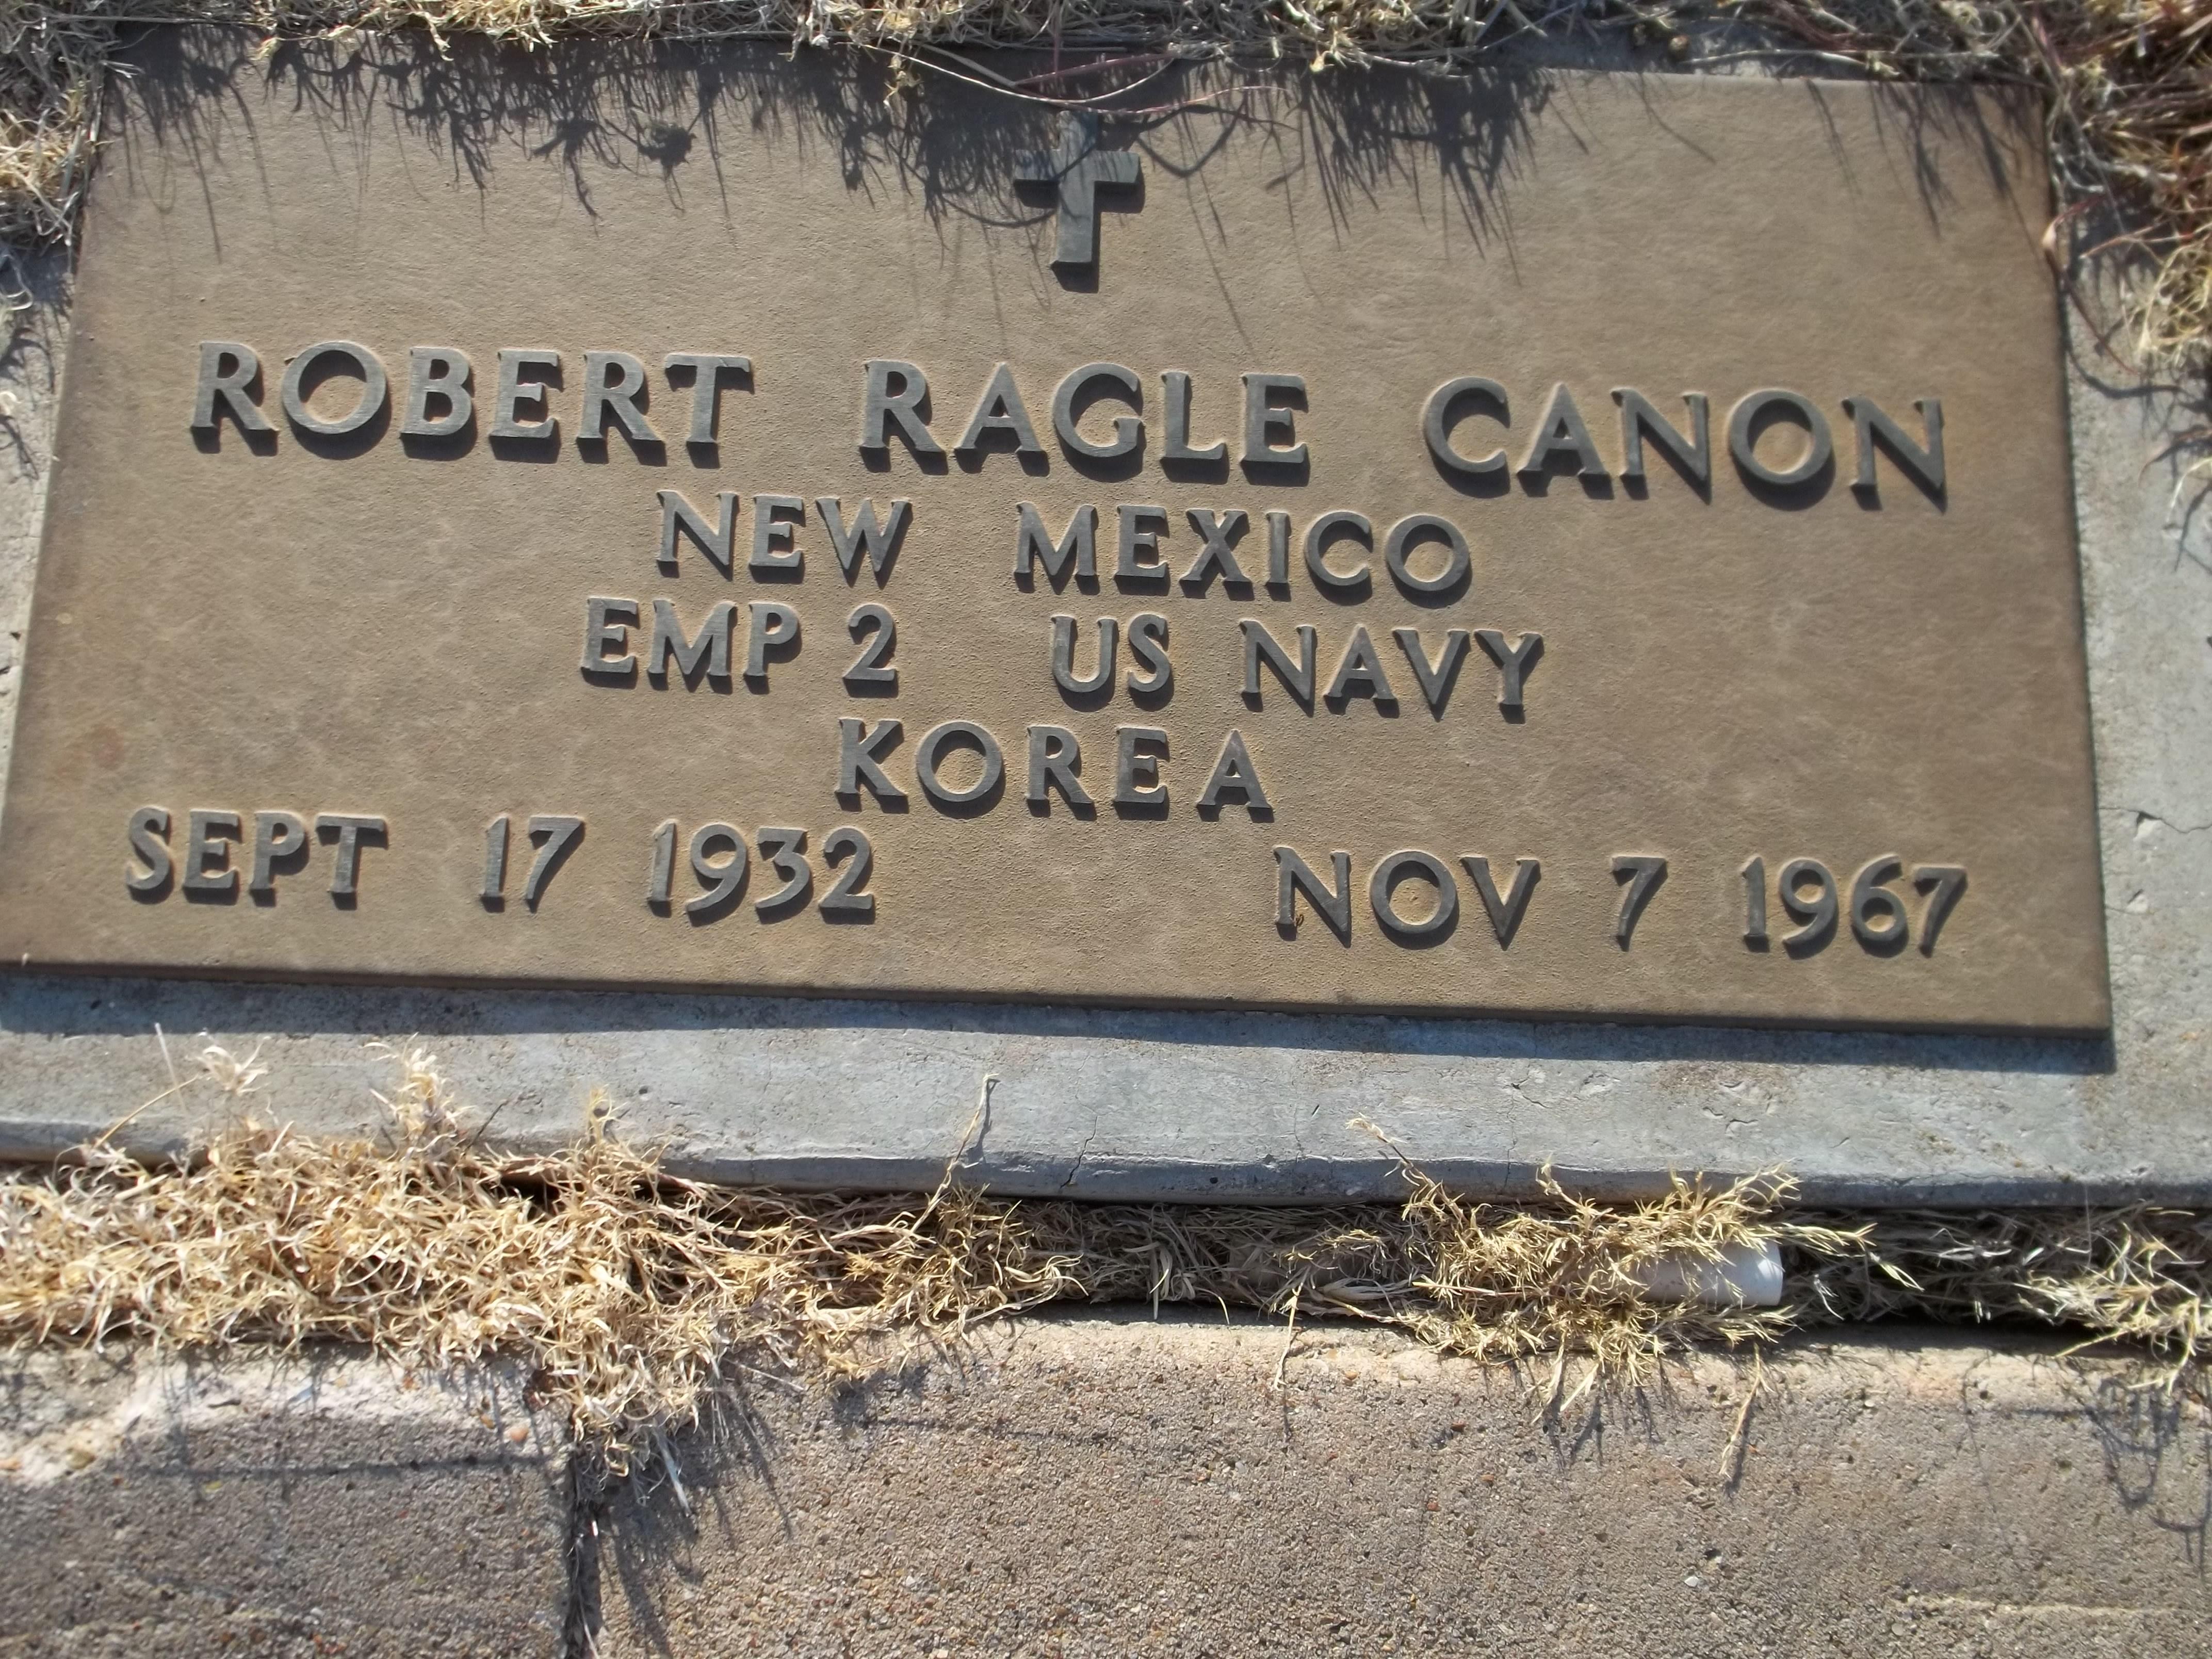 Robert Ragle Canon, Sr